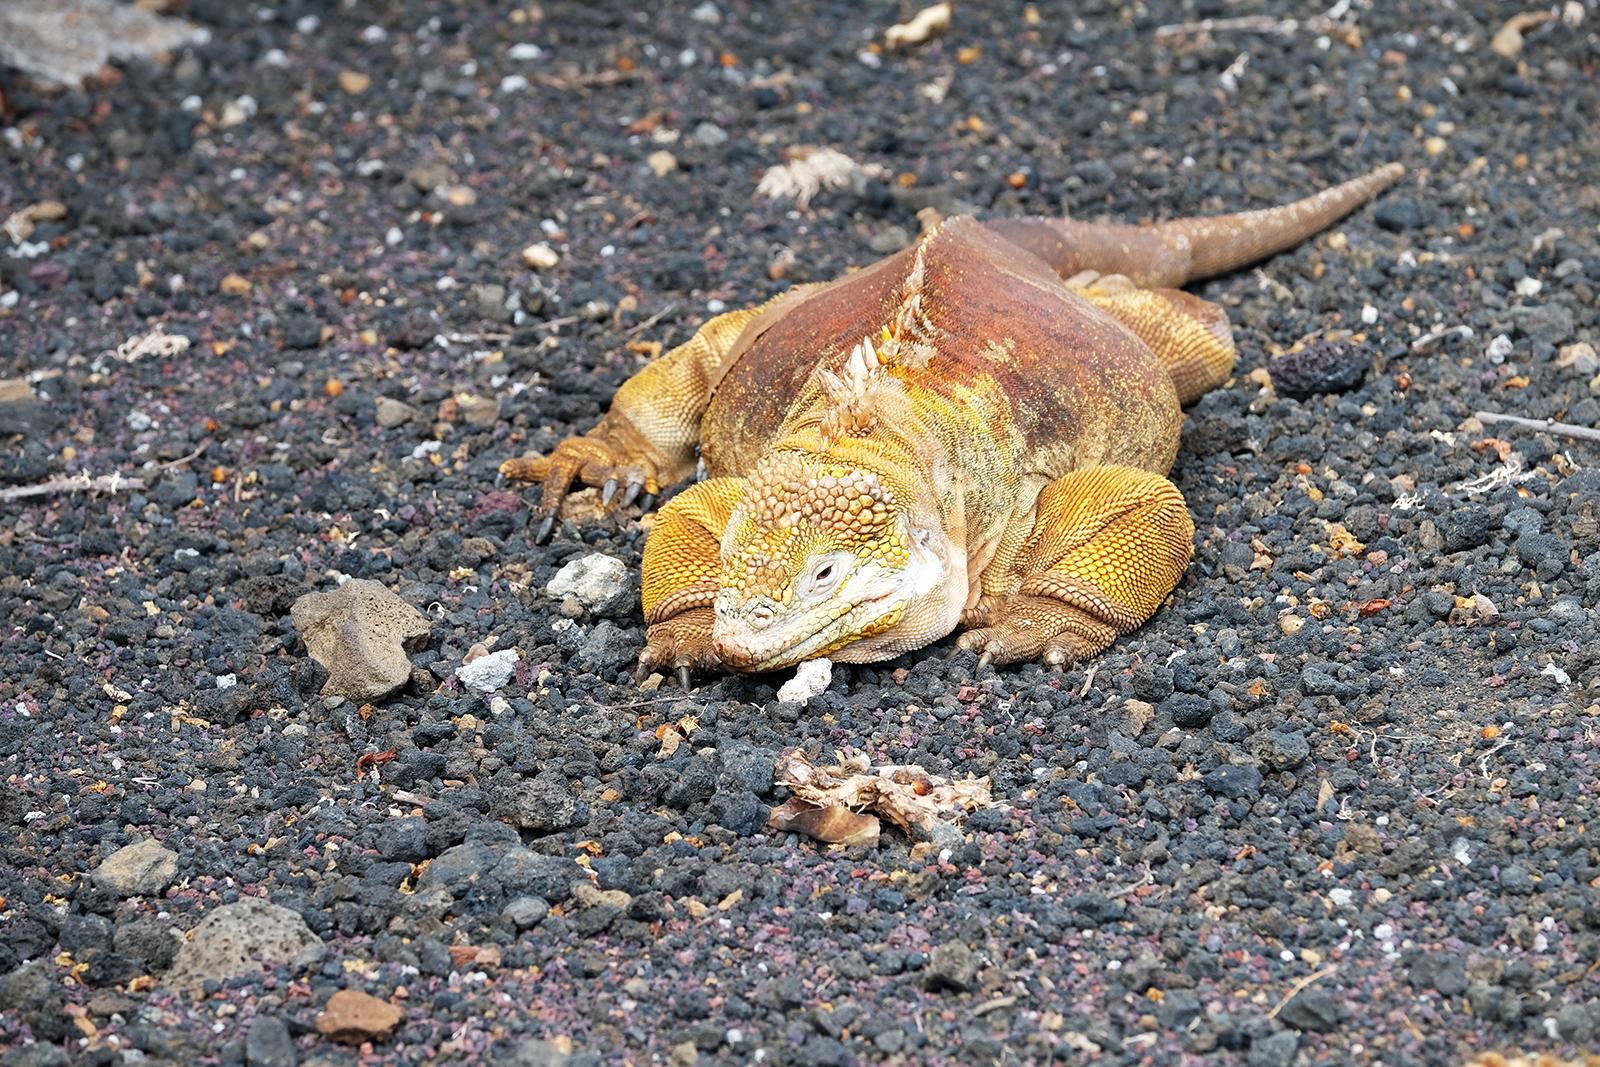 02_Estacion_Cientifica_Charles_Darwin_11_iguana_amarilla.JPG